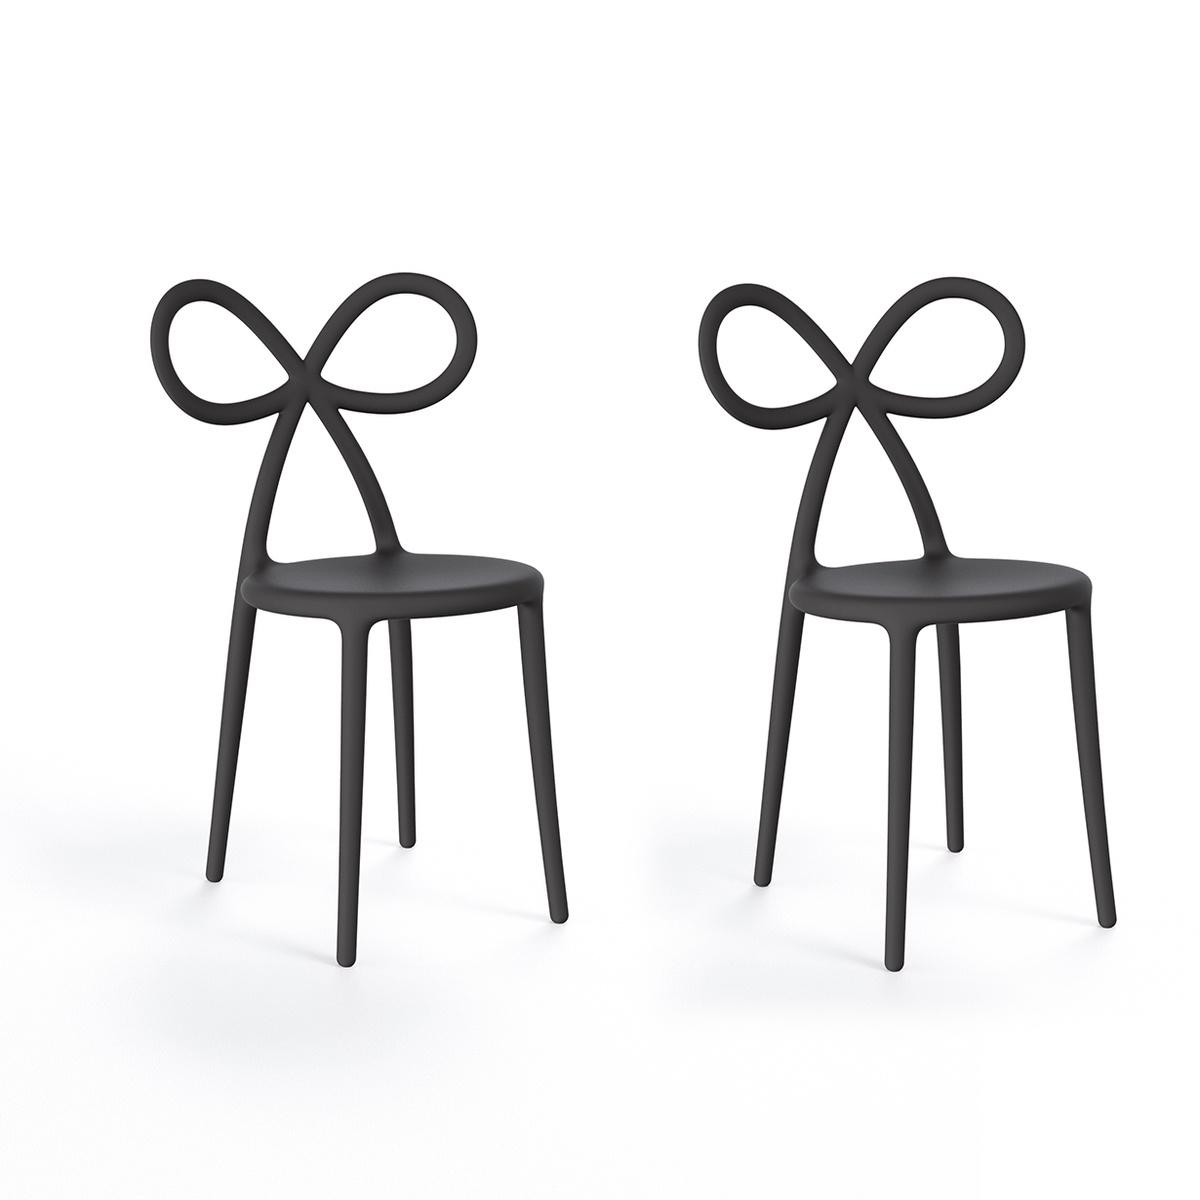 Sedie A Forma Di Sedere Costo 2 sedie ribbon